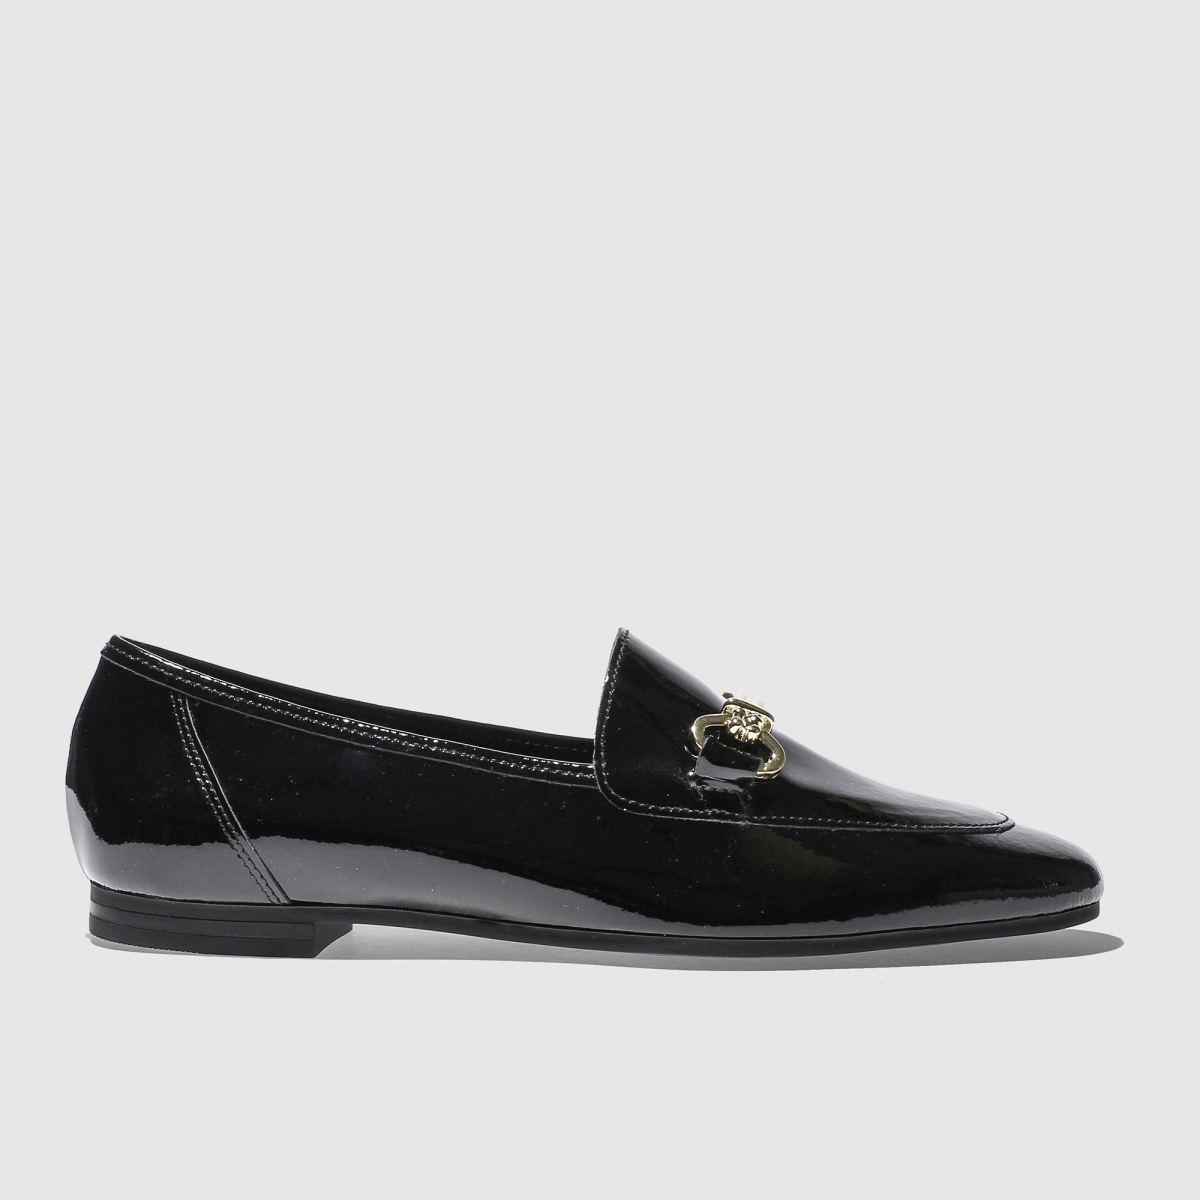 schuh black dandy flat shoes